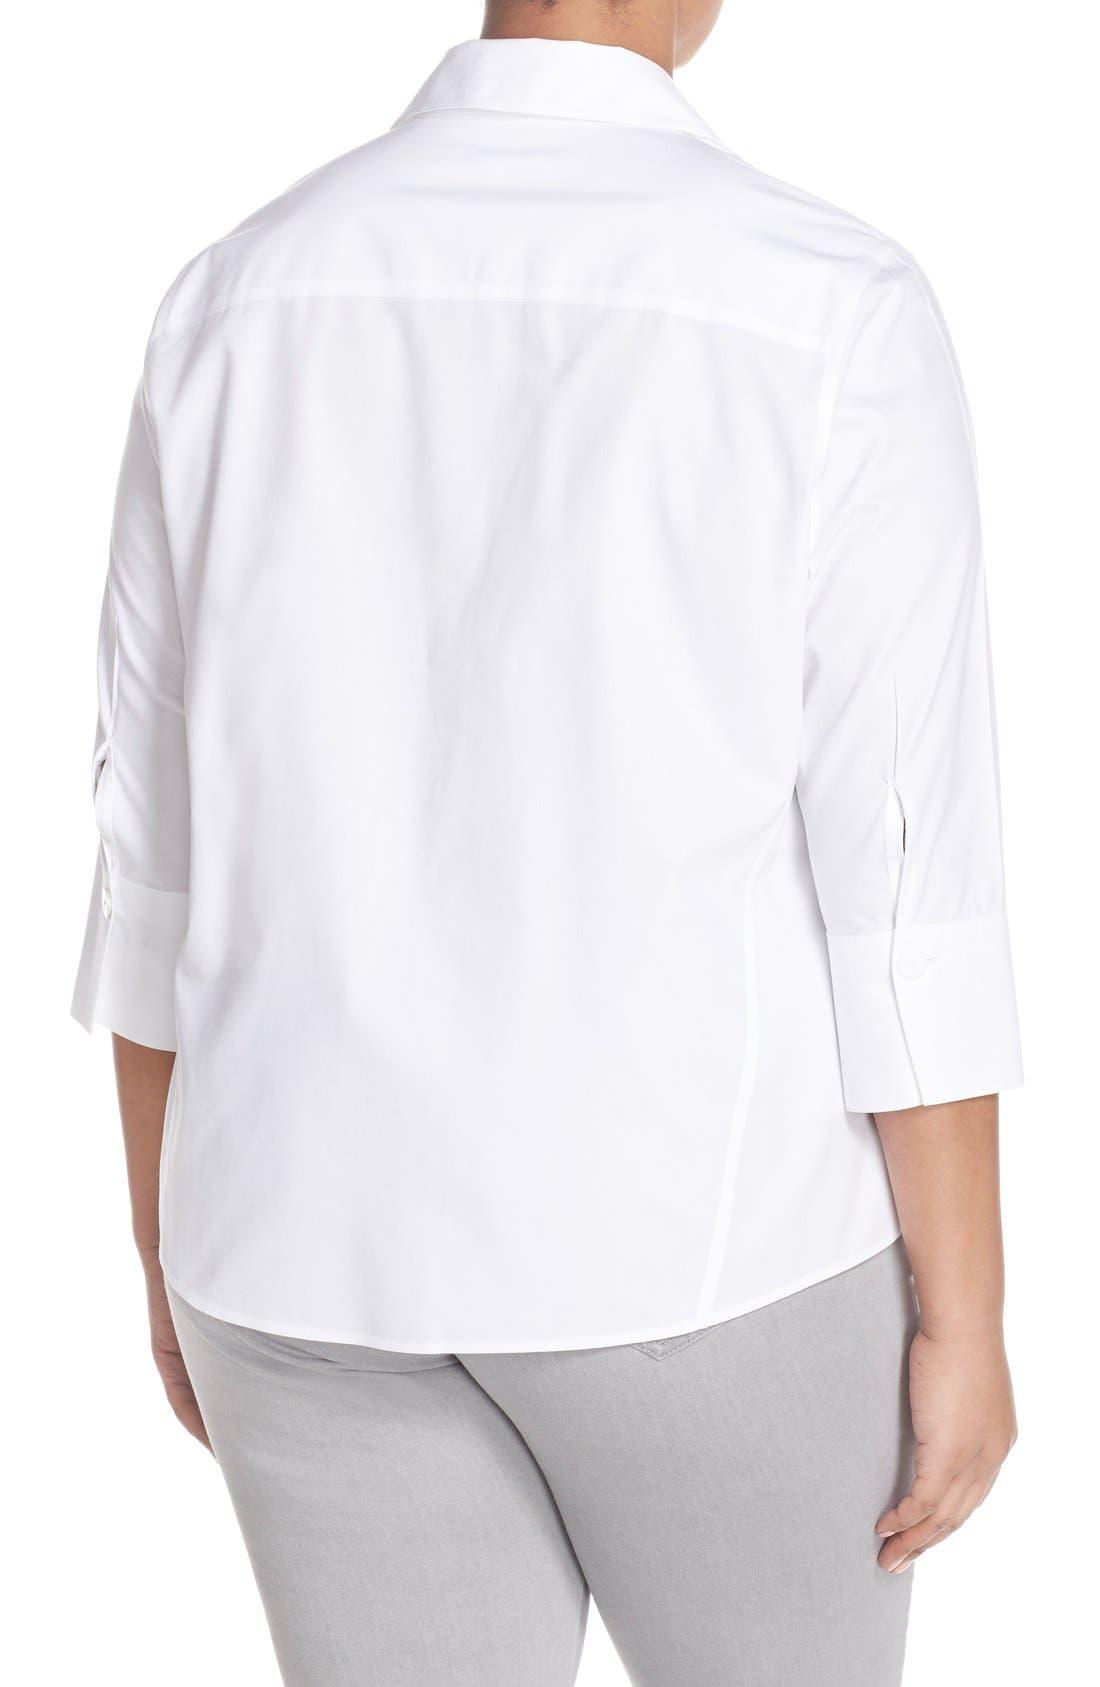 Paige Non-Iron Cotton Shirt,                             Alternate thumbnail 4, color,                             WHITE